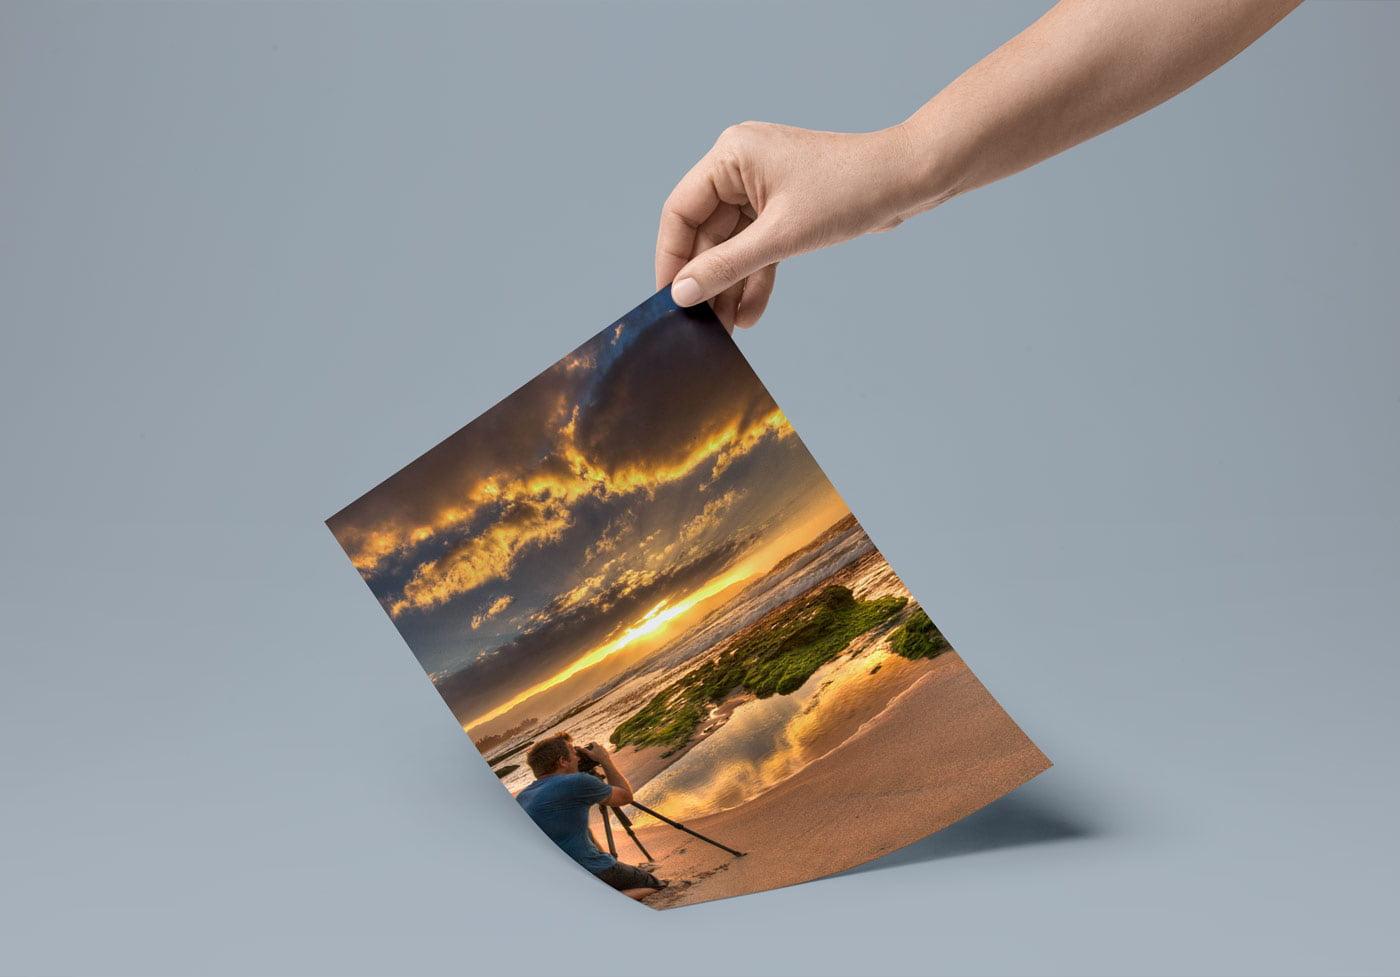 sunse photography 6 - آموزش عکاسی از غروب آفتاب